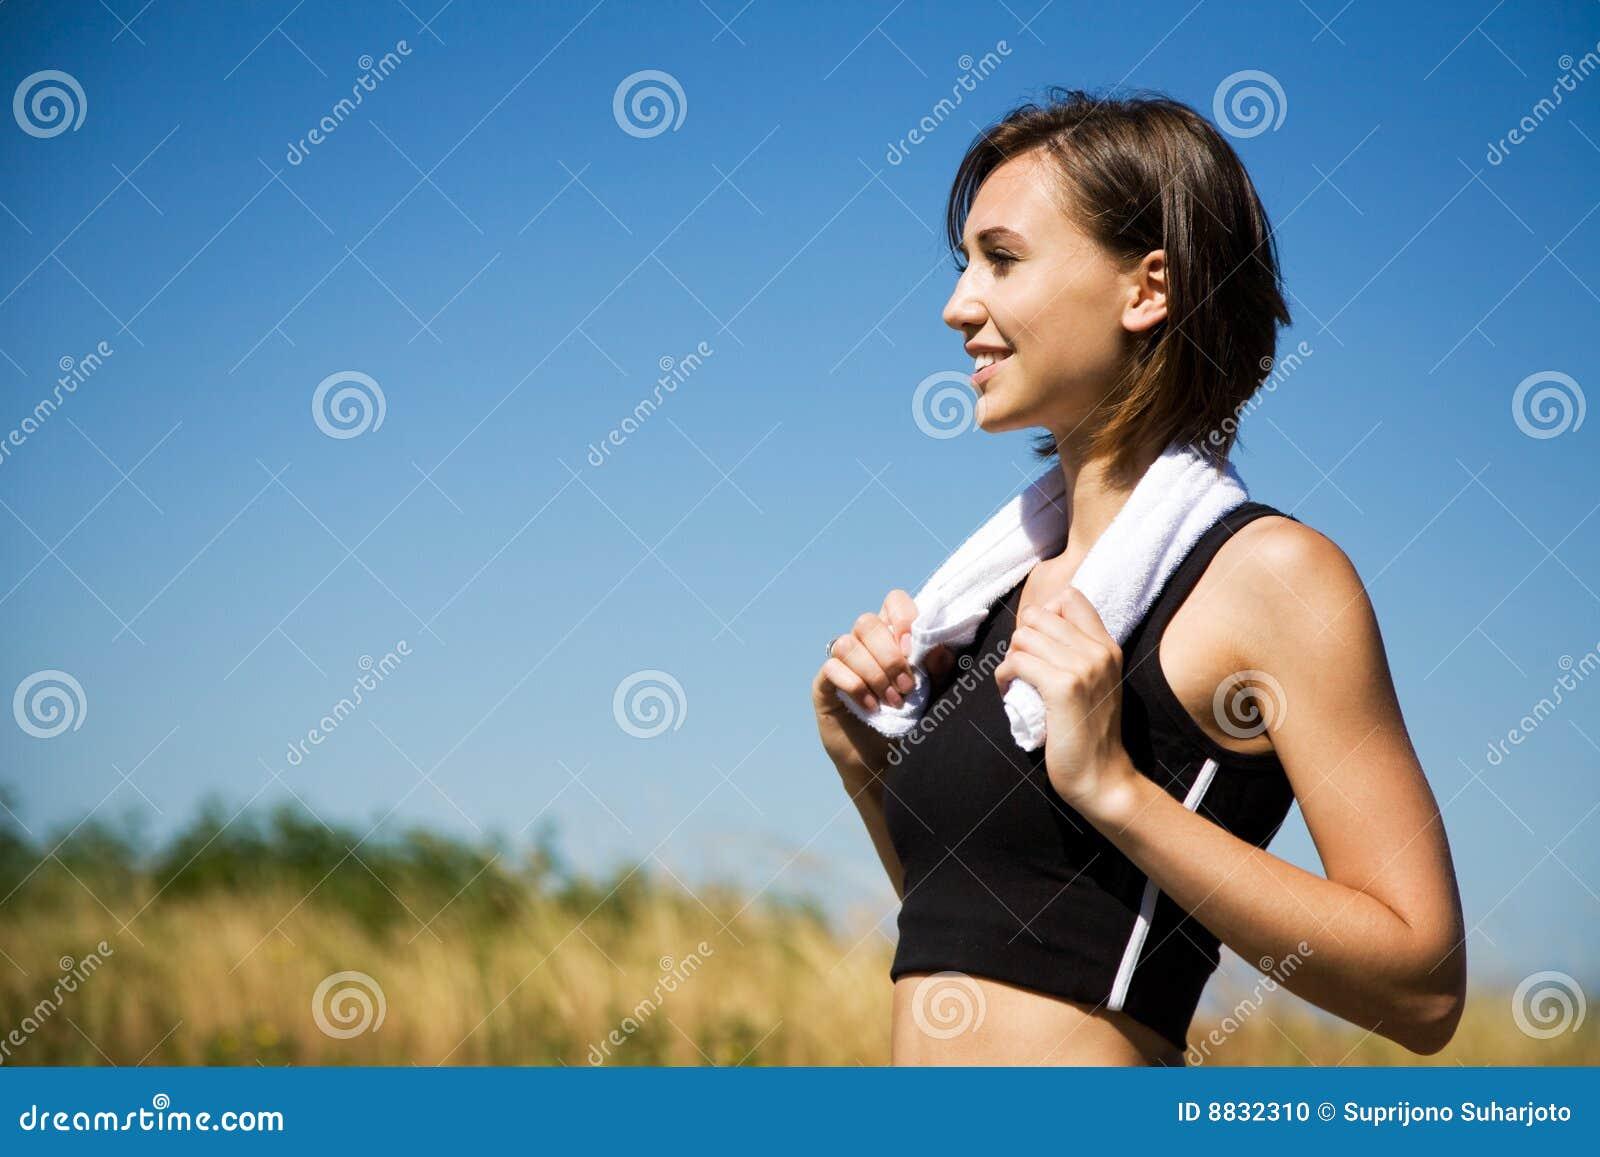 Caucasian girl exercise outdoor